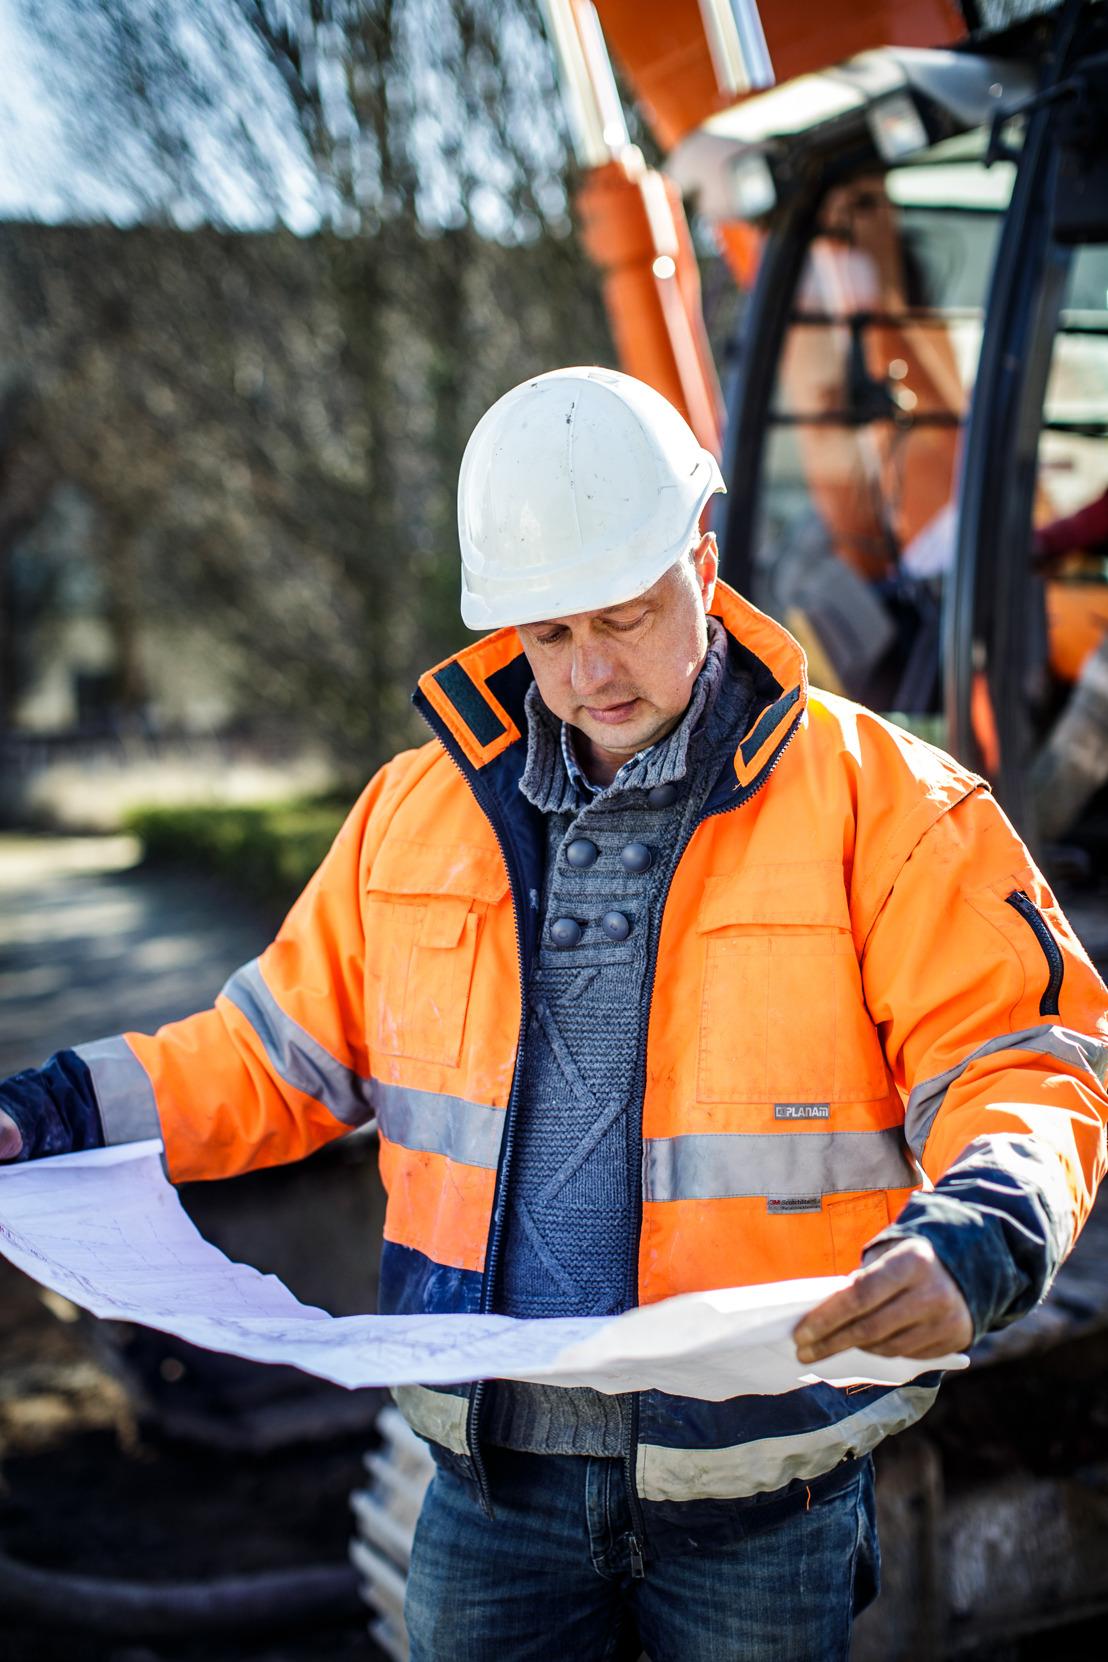 Rioleringswerken gepland in Langemark-Poelkapelle